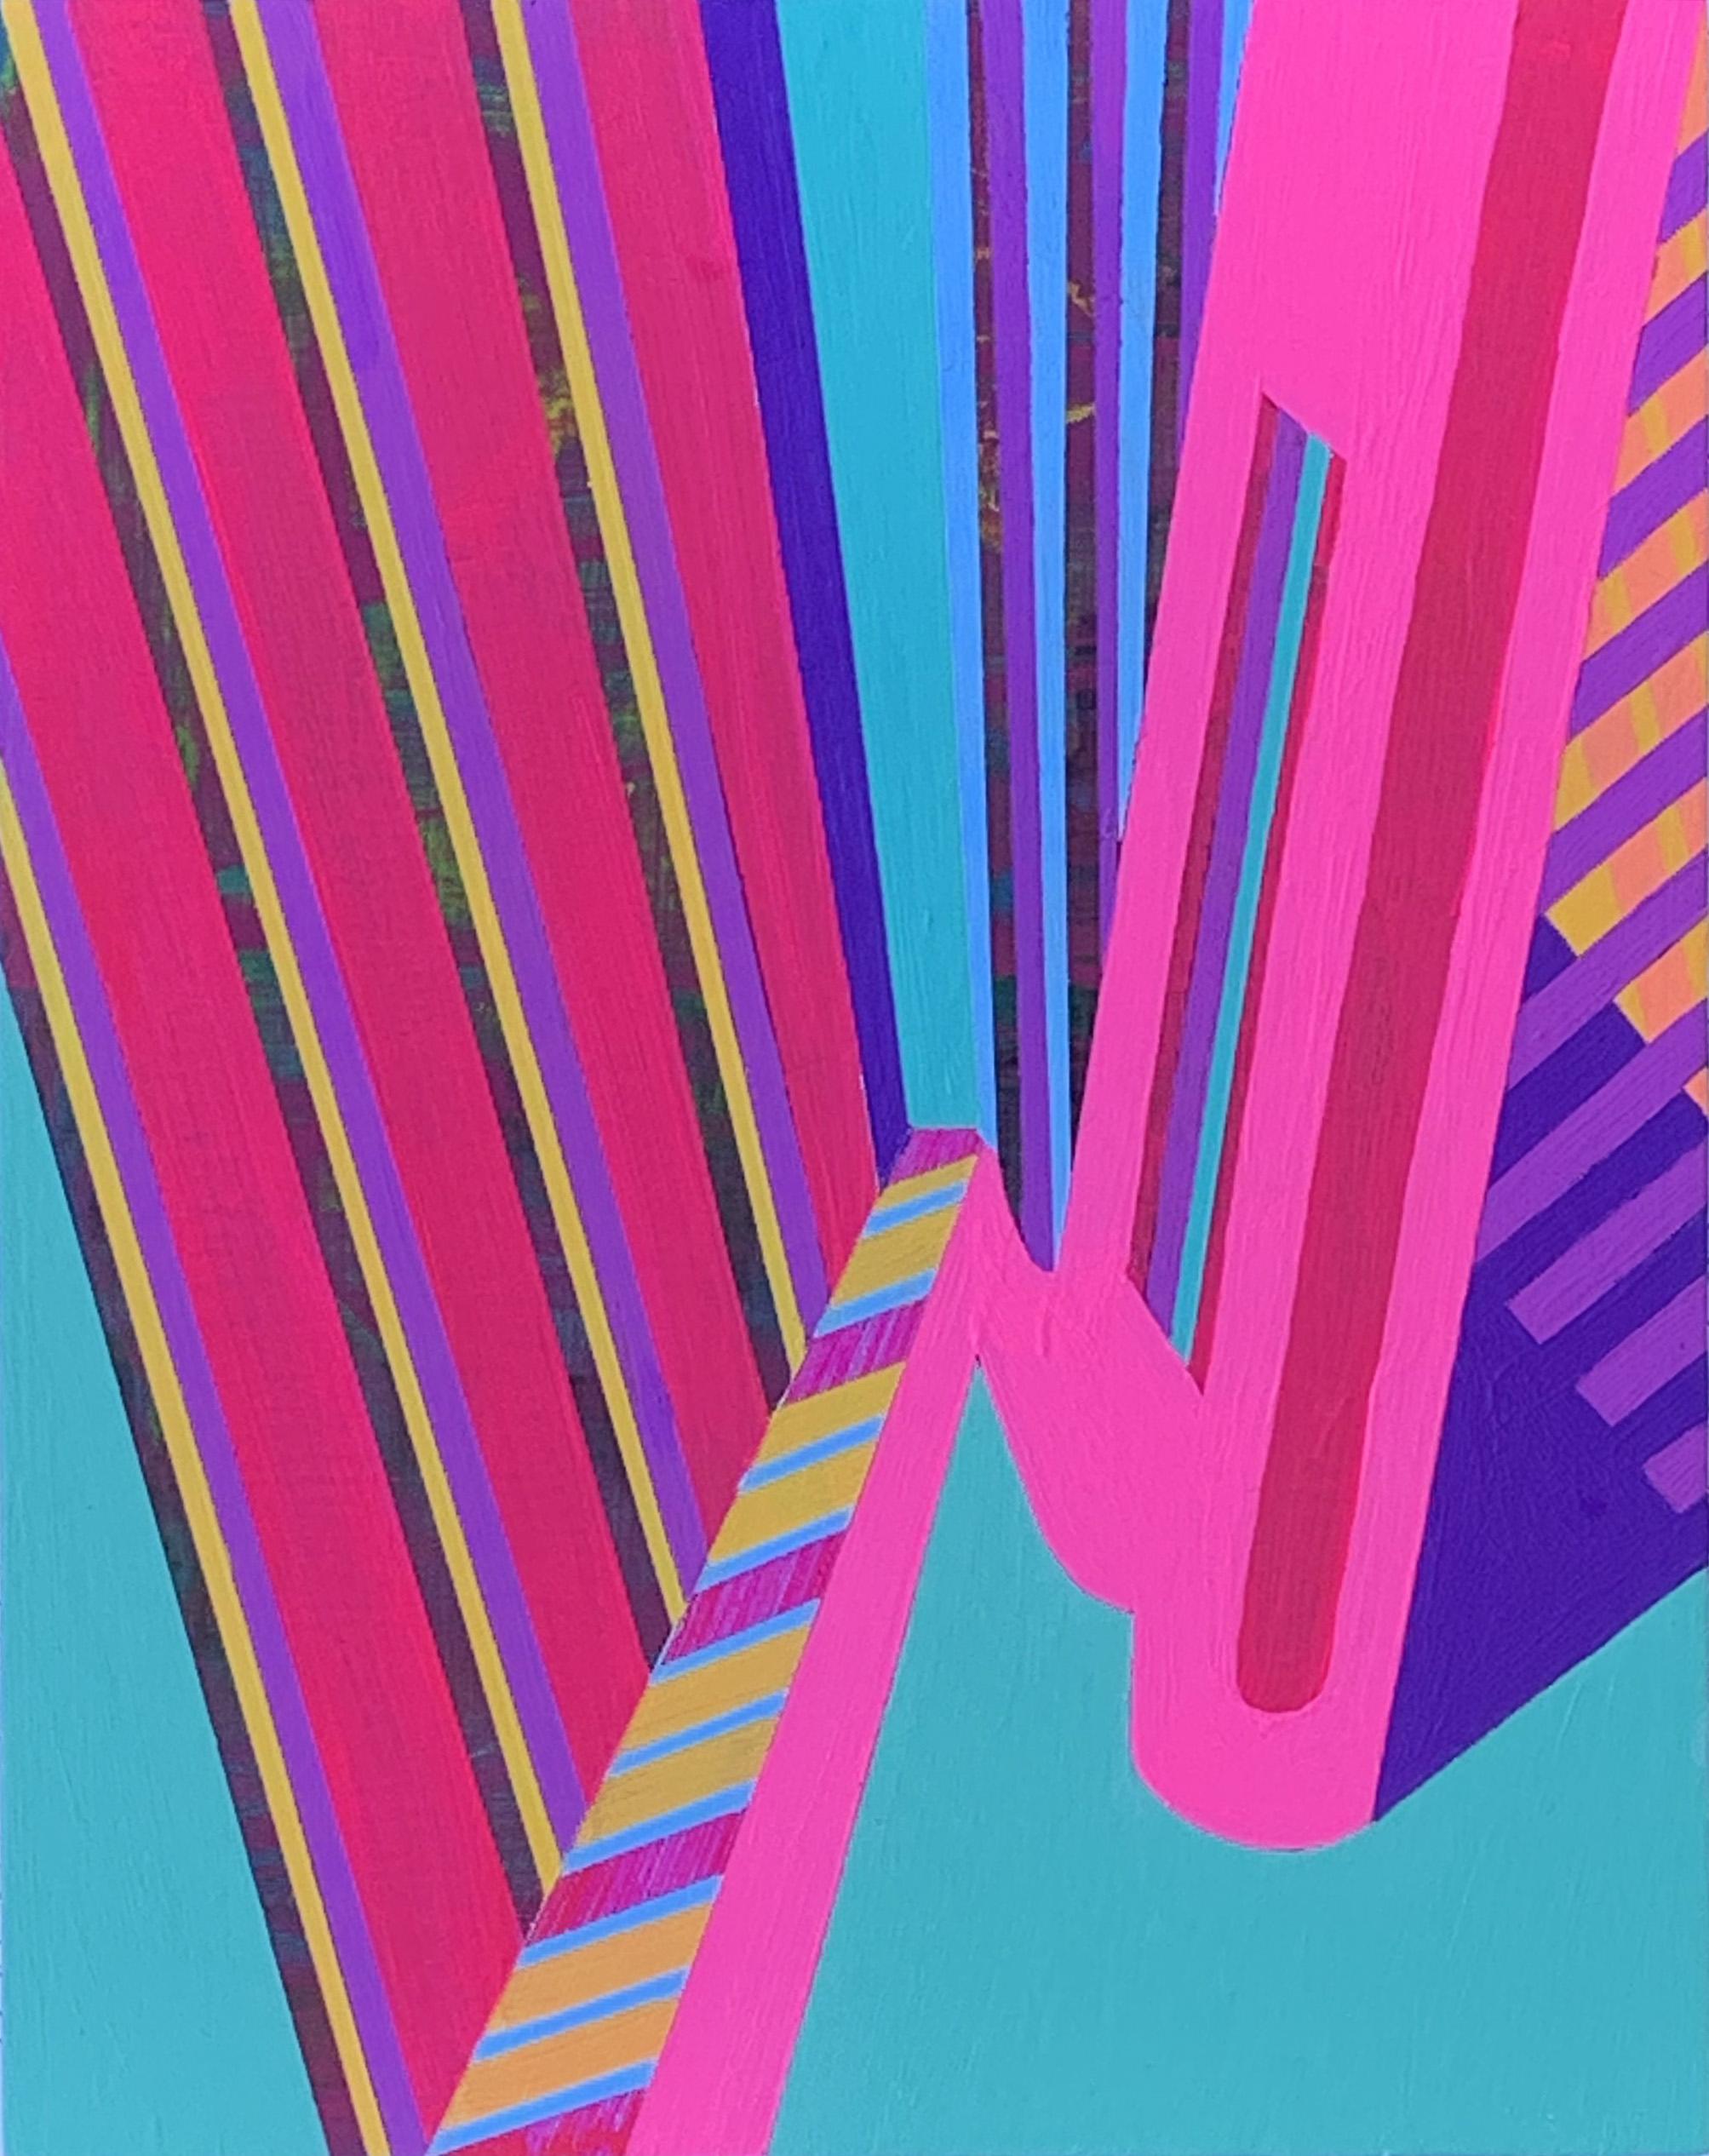 Morning on the Patio 2 , 10x8, acrylic on panel